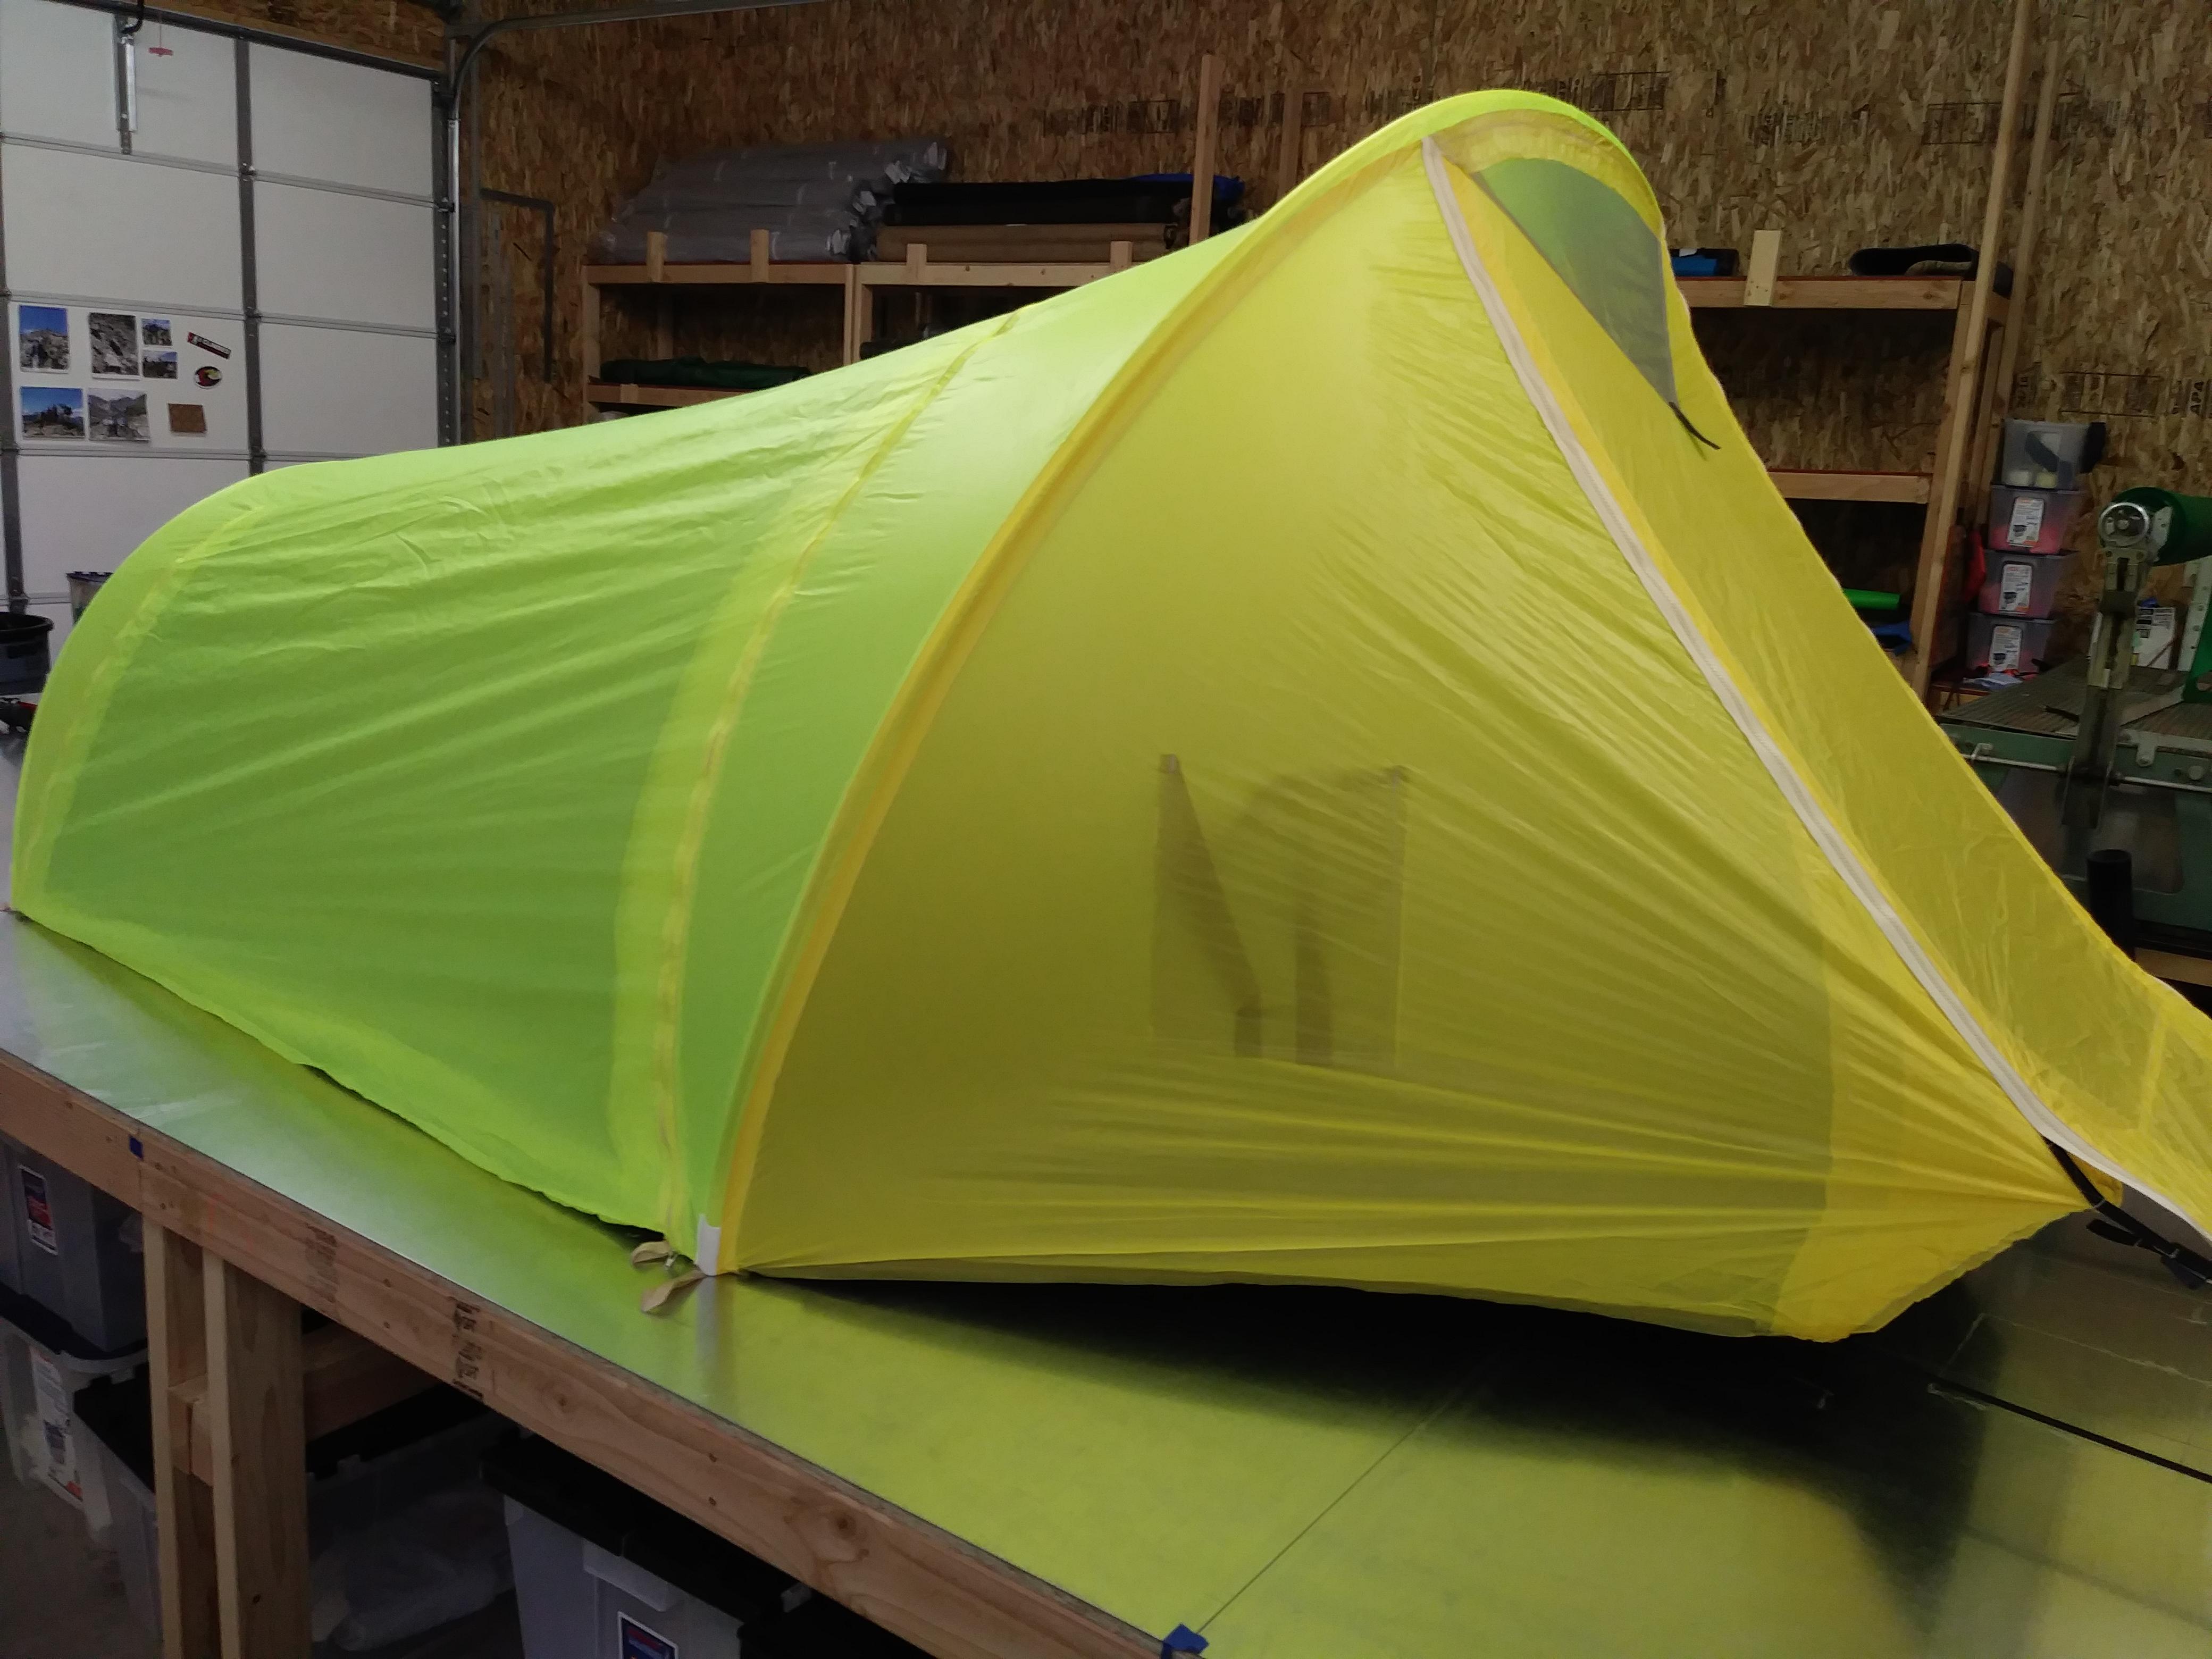 competitive price cbe82 734b1 *QUICK SHIP* Standard Two-Person Tent - 2X